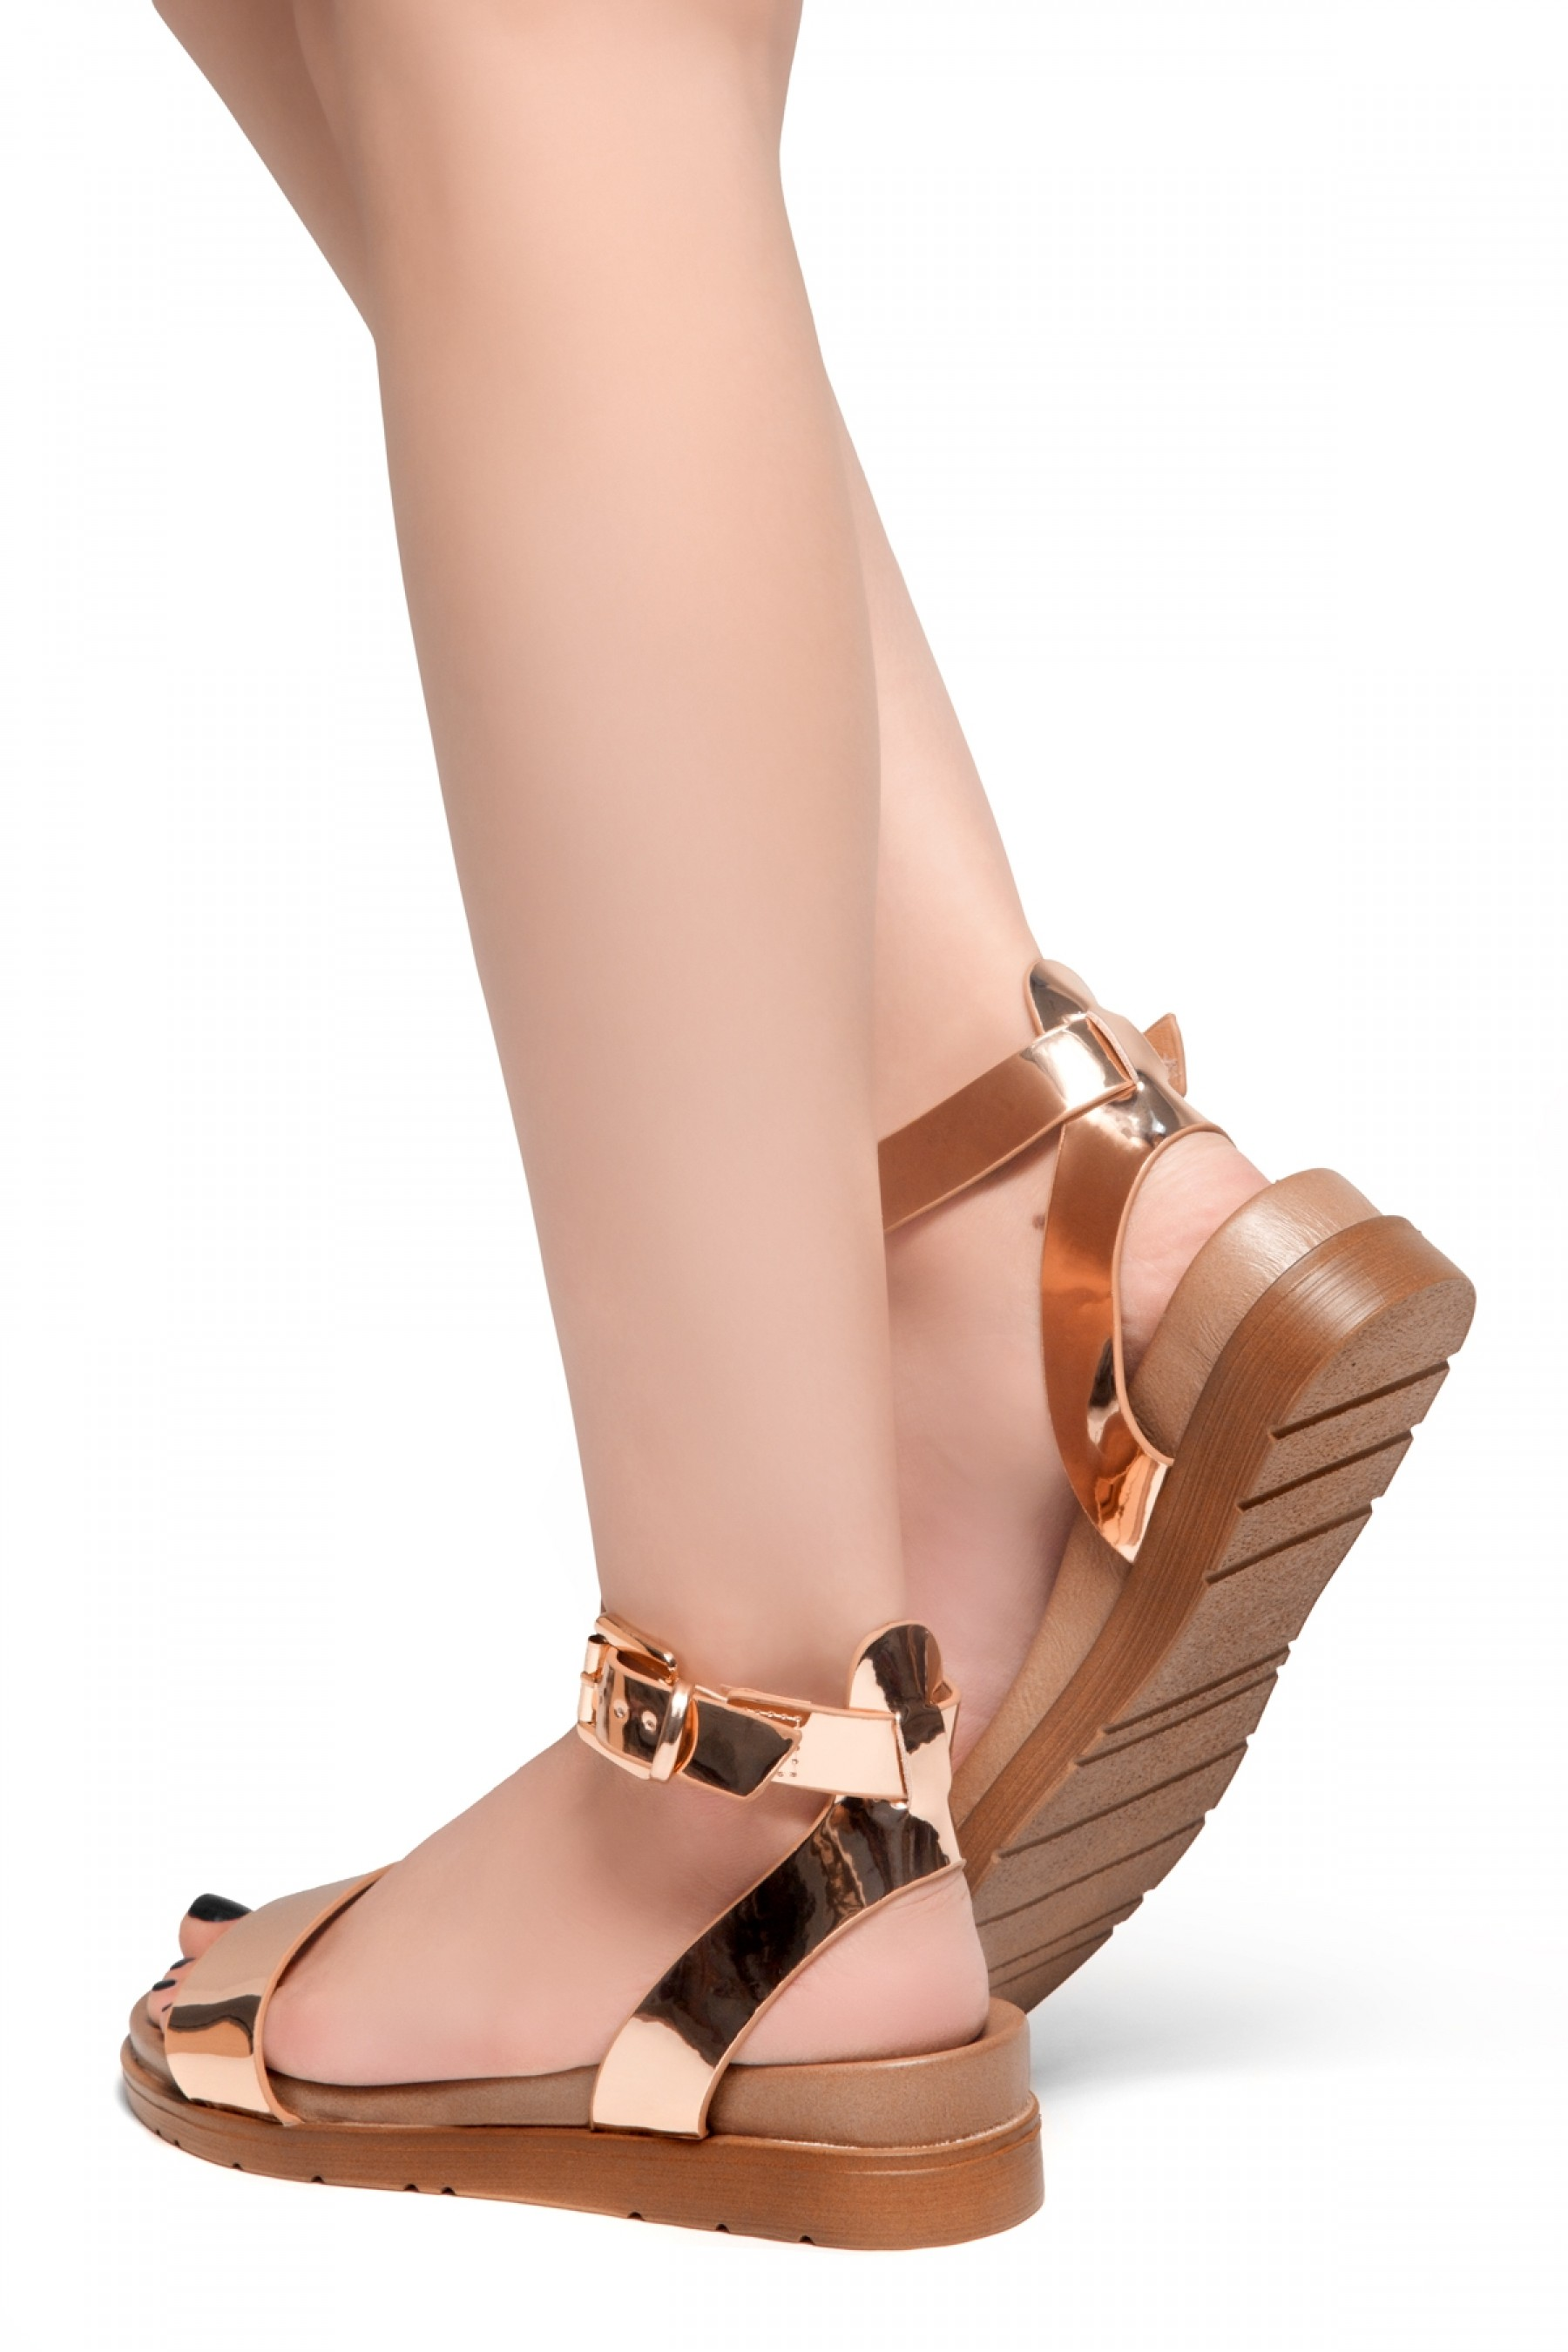 0f540bc71f5f HerStyle Needed Me- Ankle Strap Flat Platform Sandal (RoseGold)